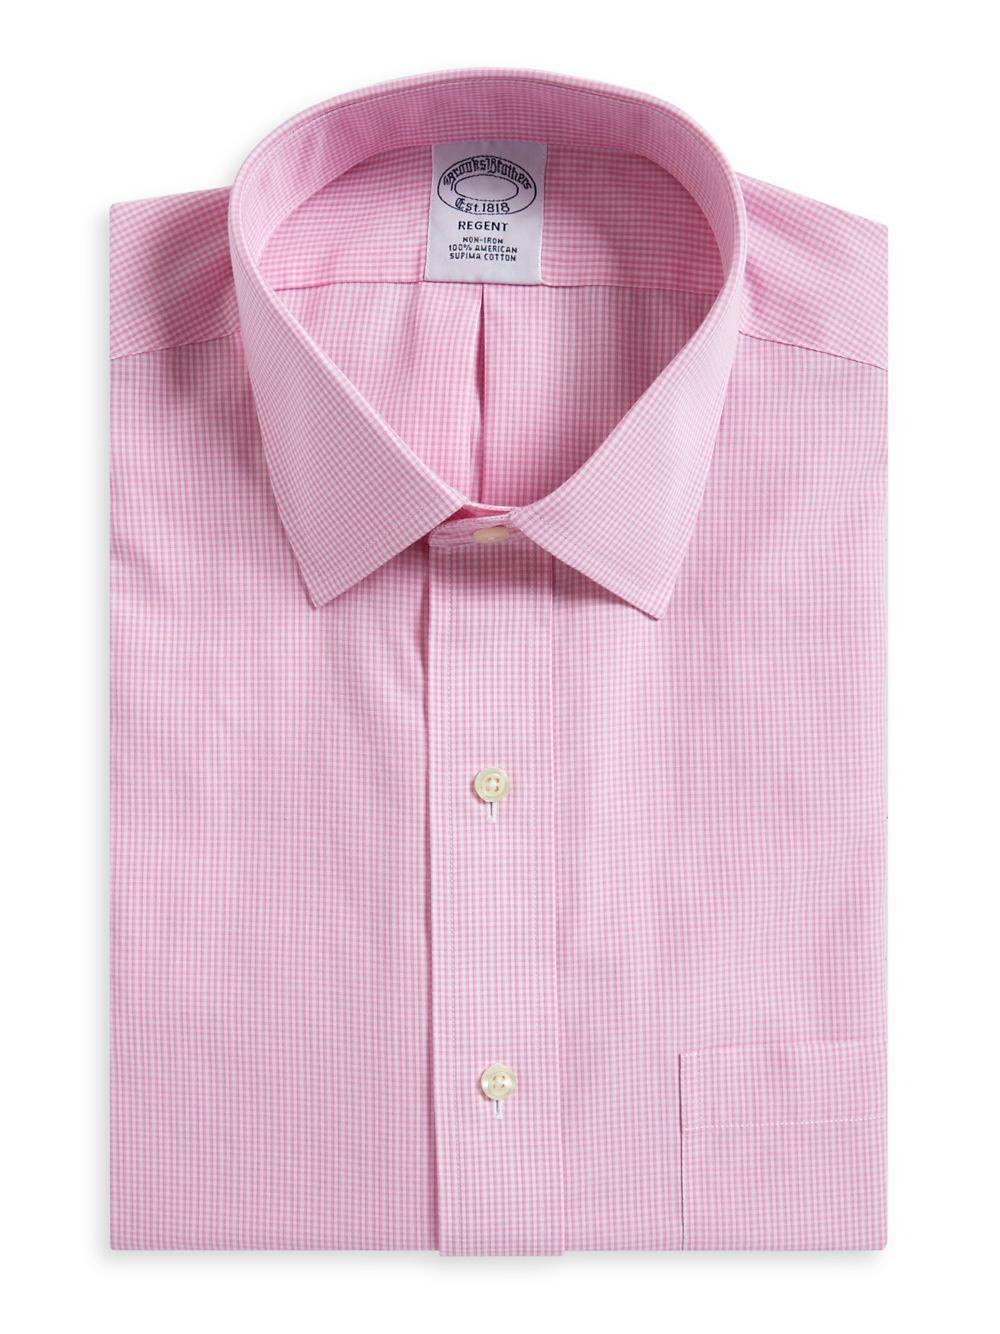 9d556217345 Lyst - Brooks Brothers Gingham Print Regent Fit Dress Shirt in Pink ...